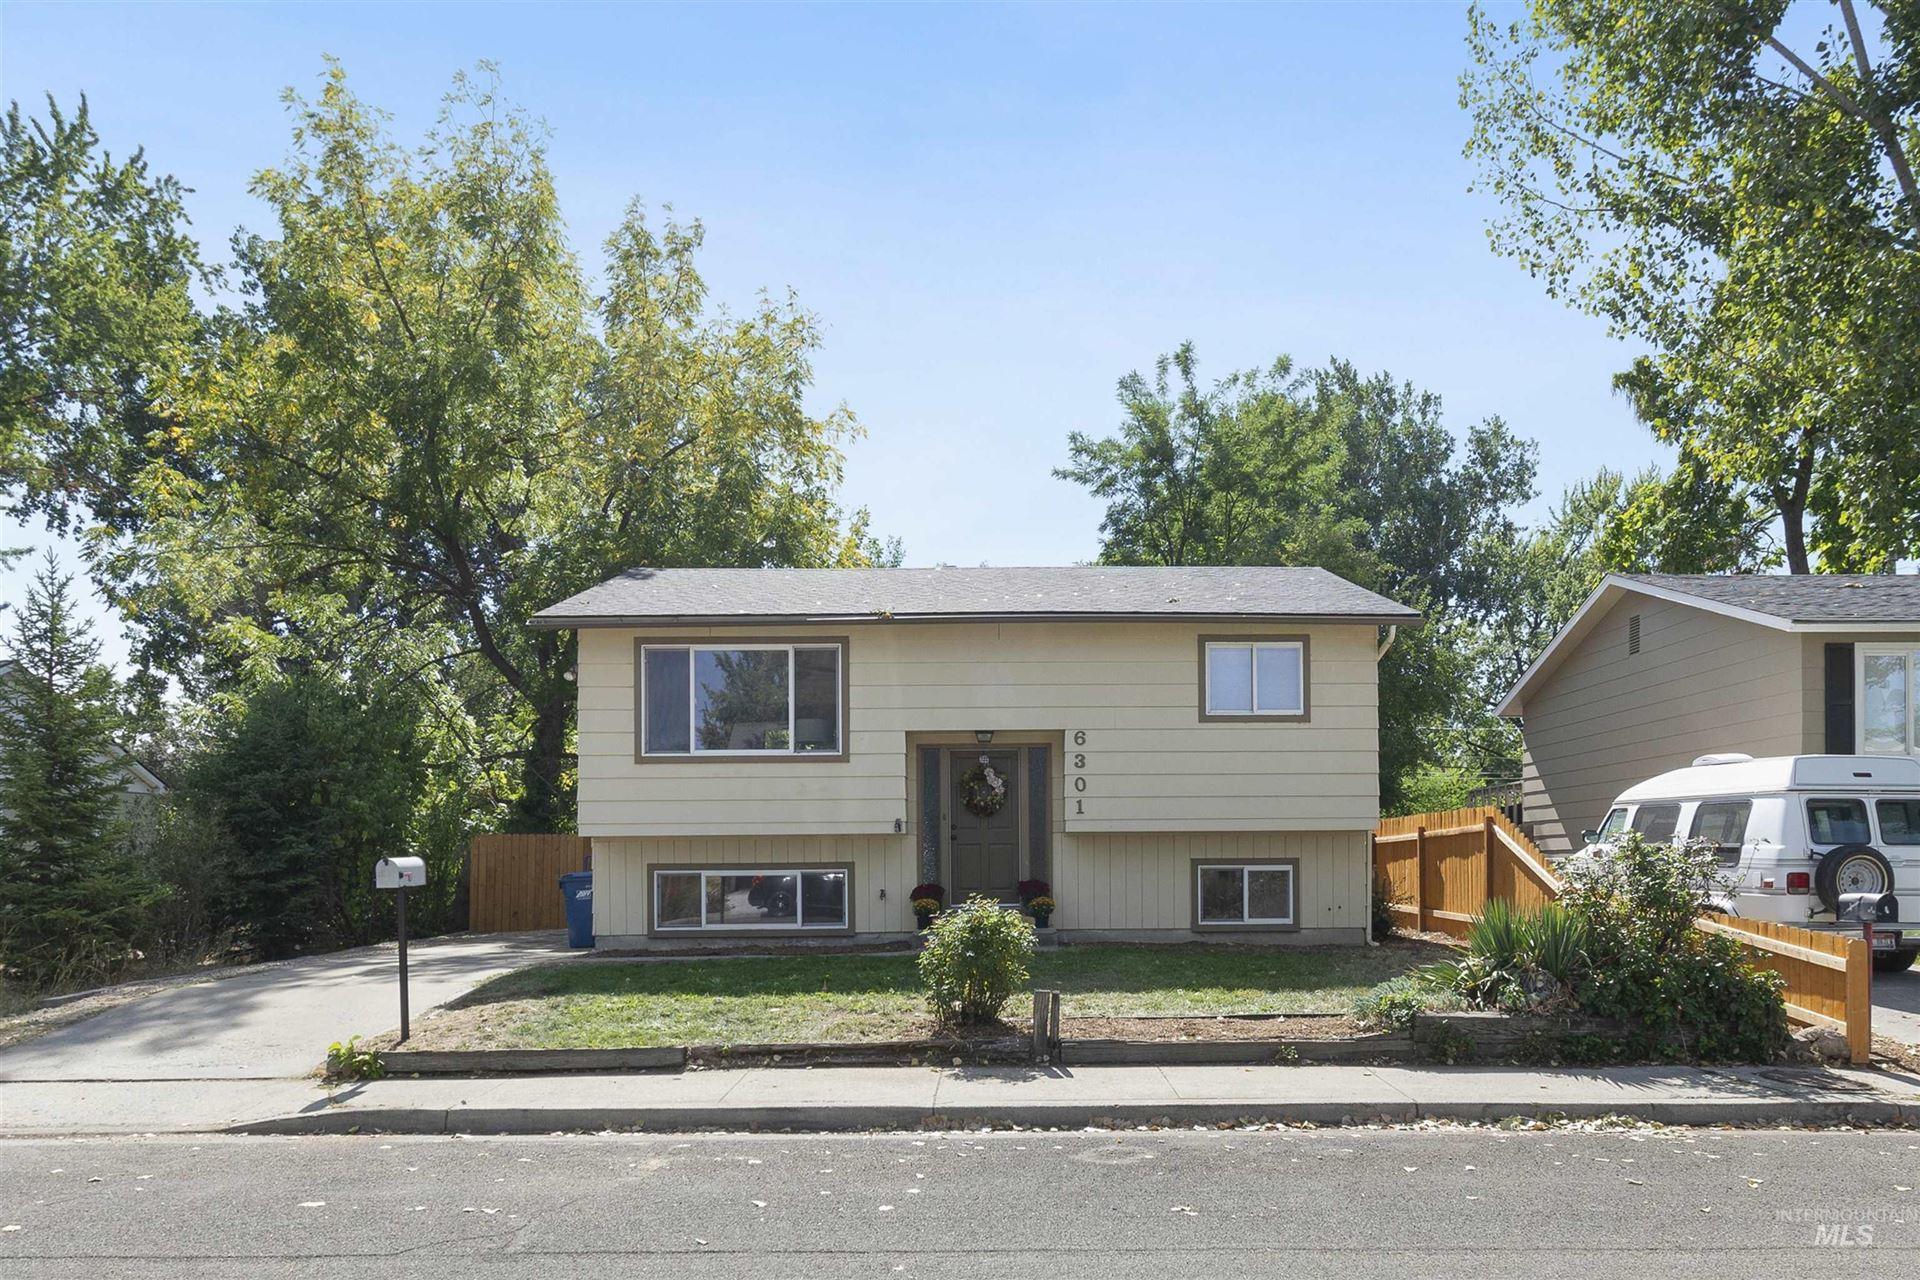 6301 W Poplar St, Boise, ID 83704 - MLS#: 98819946